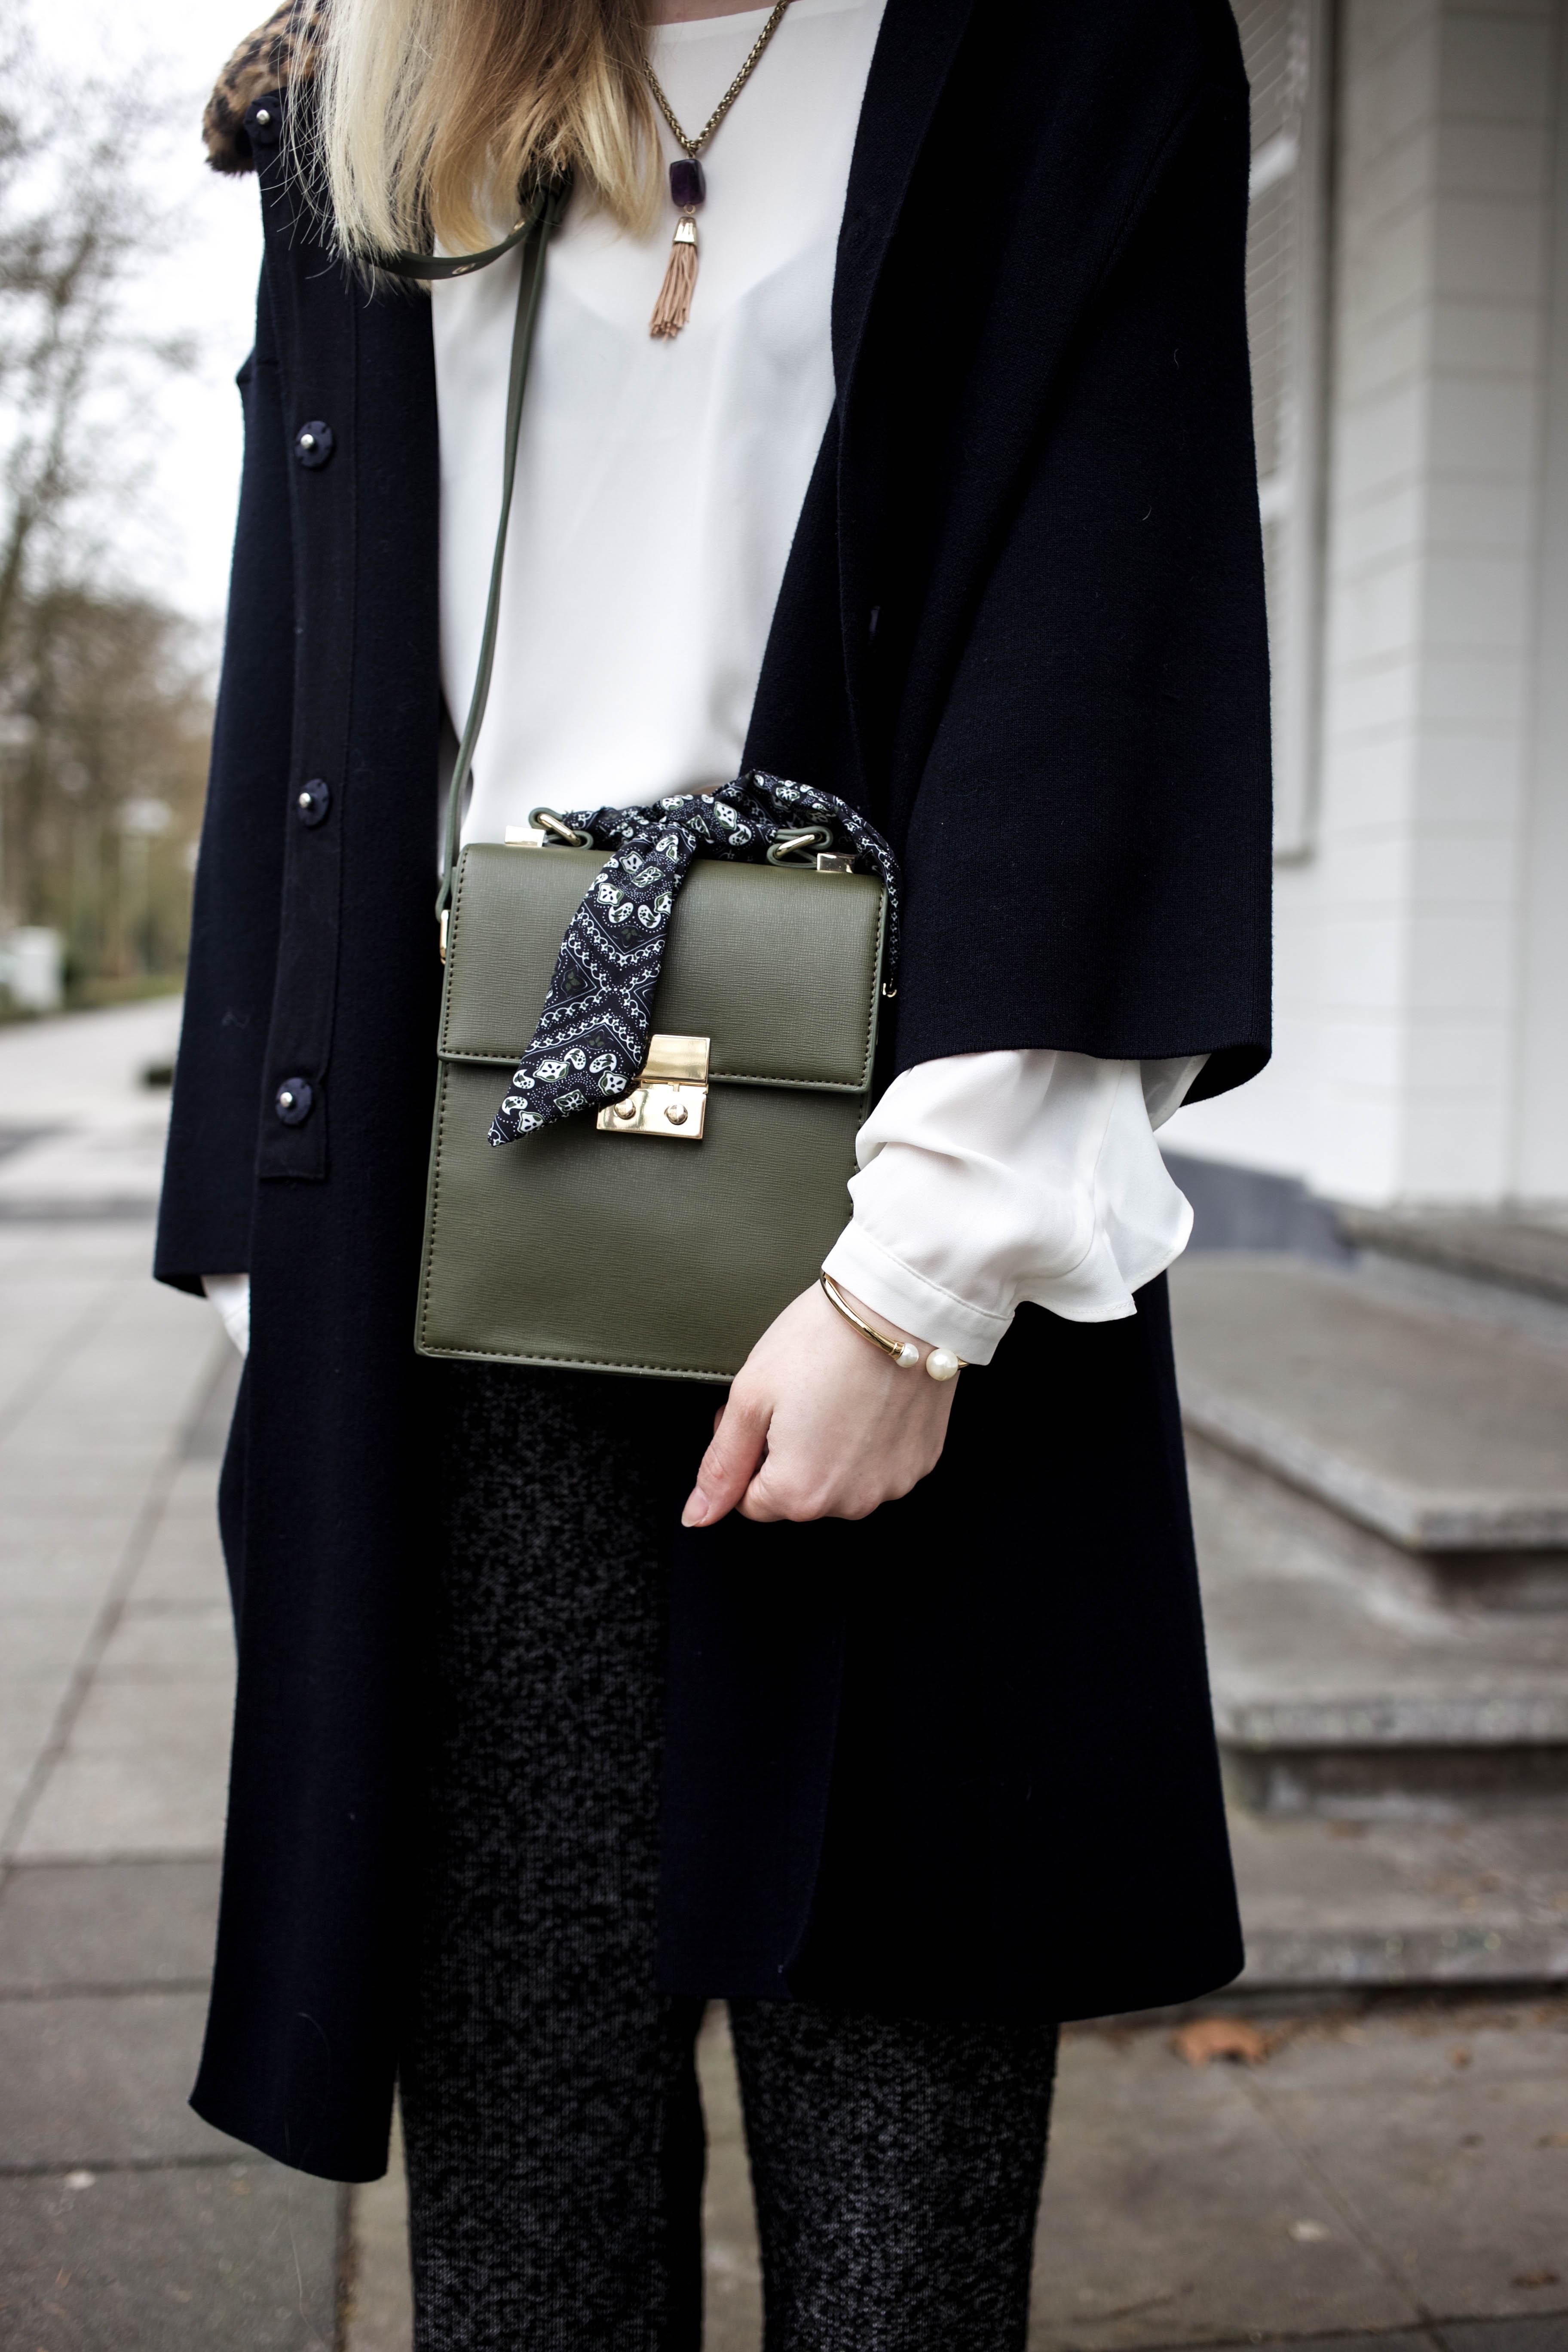 marlenehose-kombinieren-streetstyle-look-modeblog-fashion-blog-cologne-berlin-bonn_0054